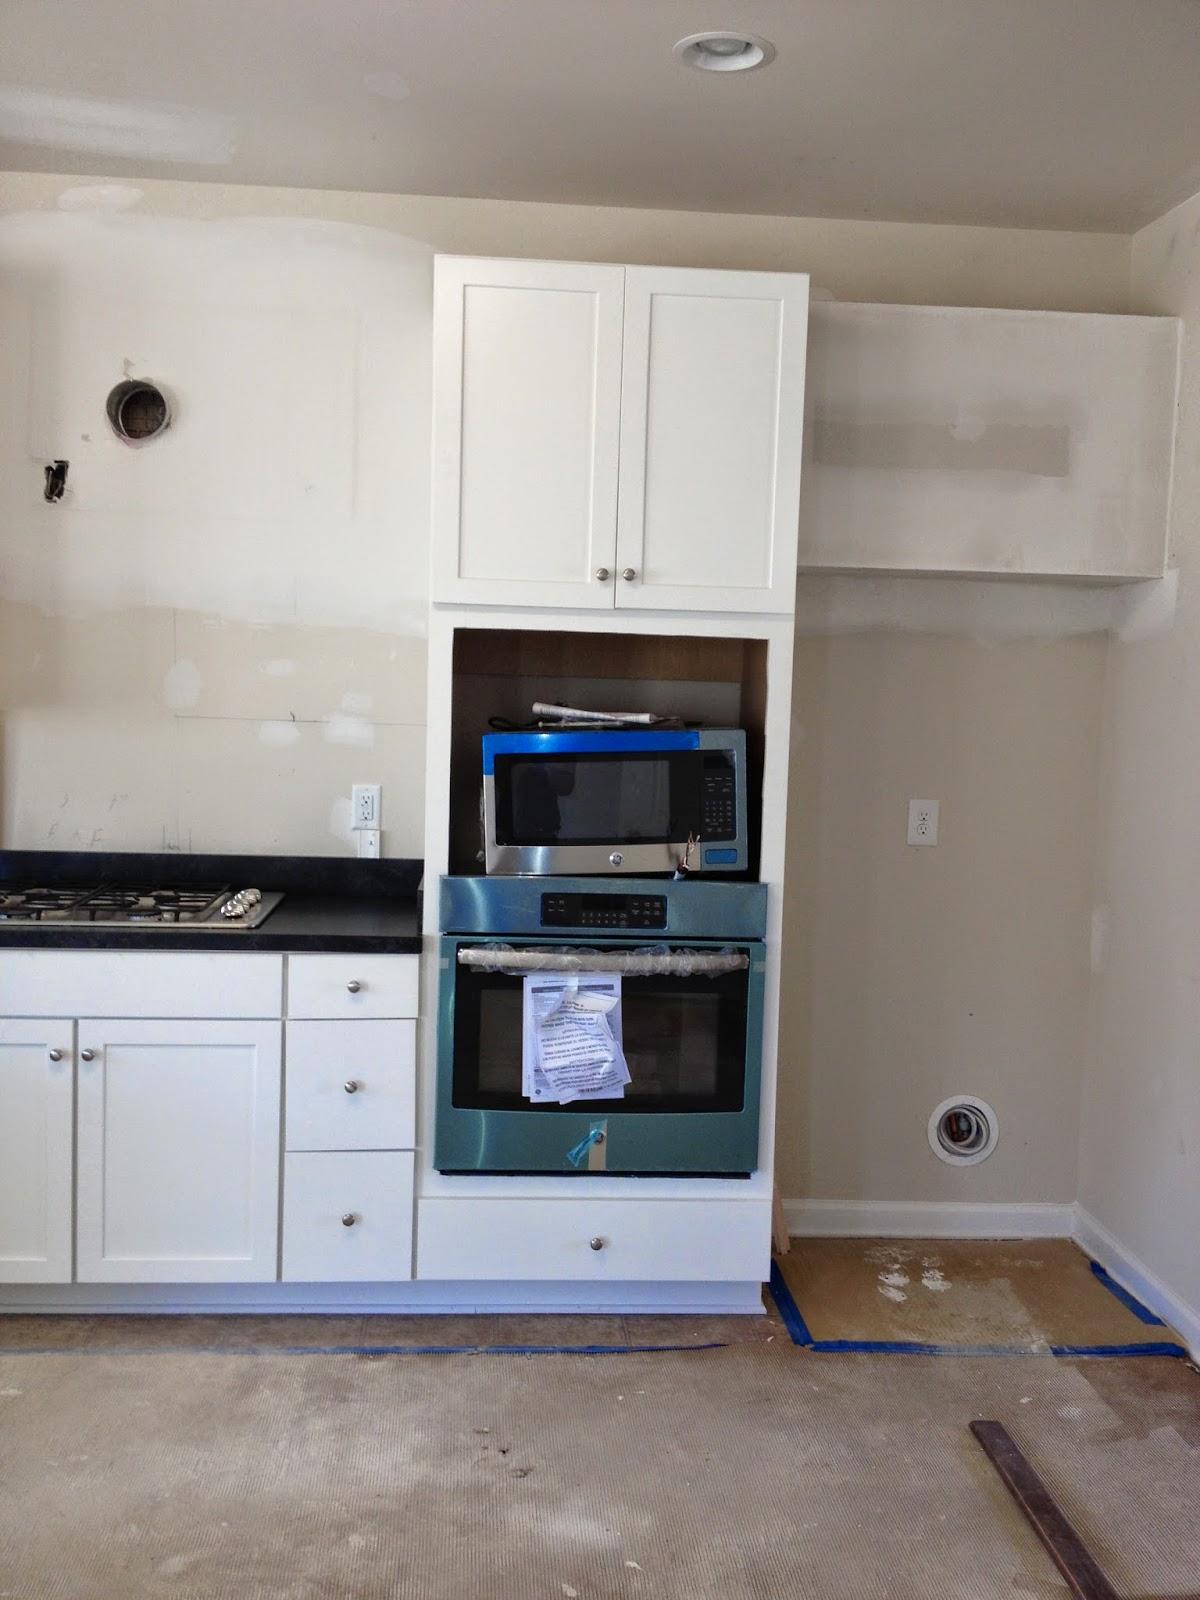 img cabinet above january fridge pinteresting our family